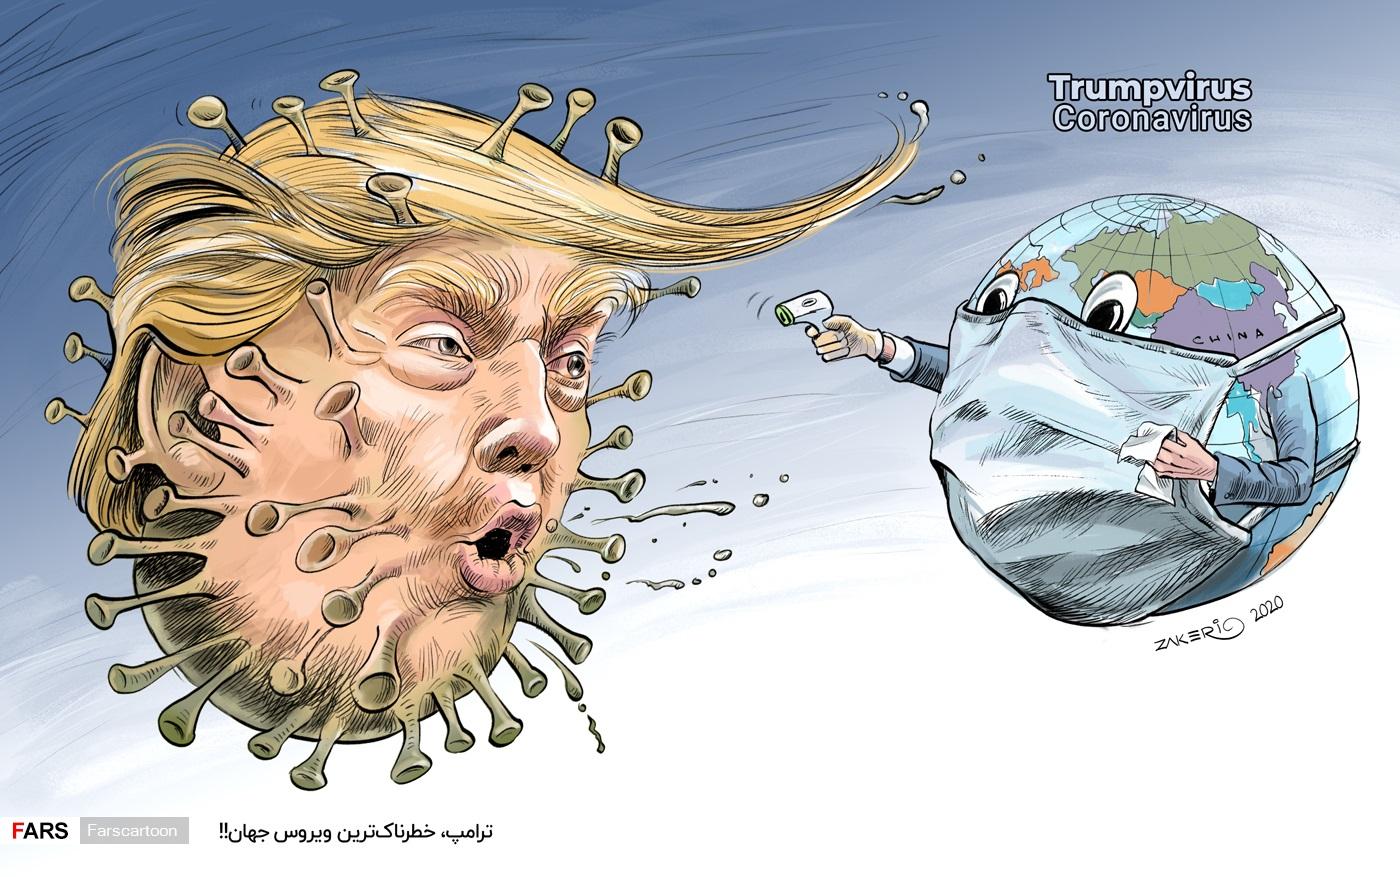 https://media.farsnews.ir/Uploaded/Files/Images/1398/12/07/13981207000831637183383460831700_96057_PhotoT.jpg